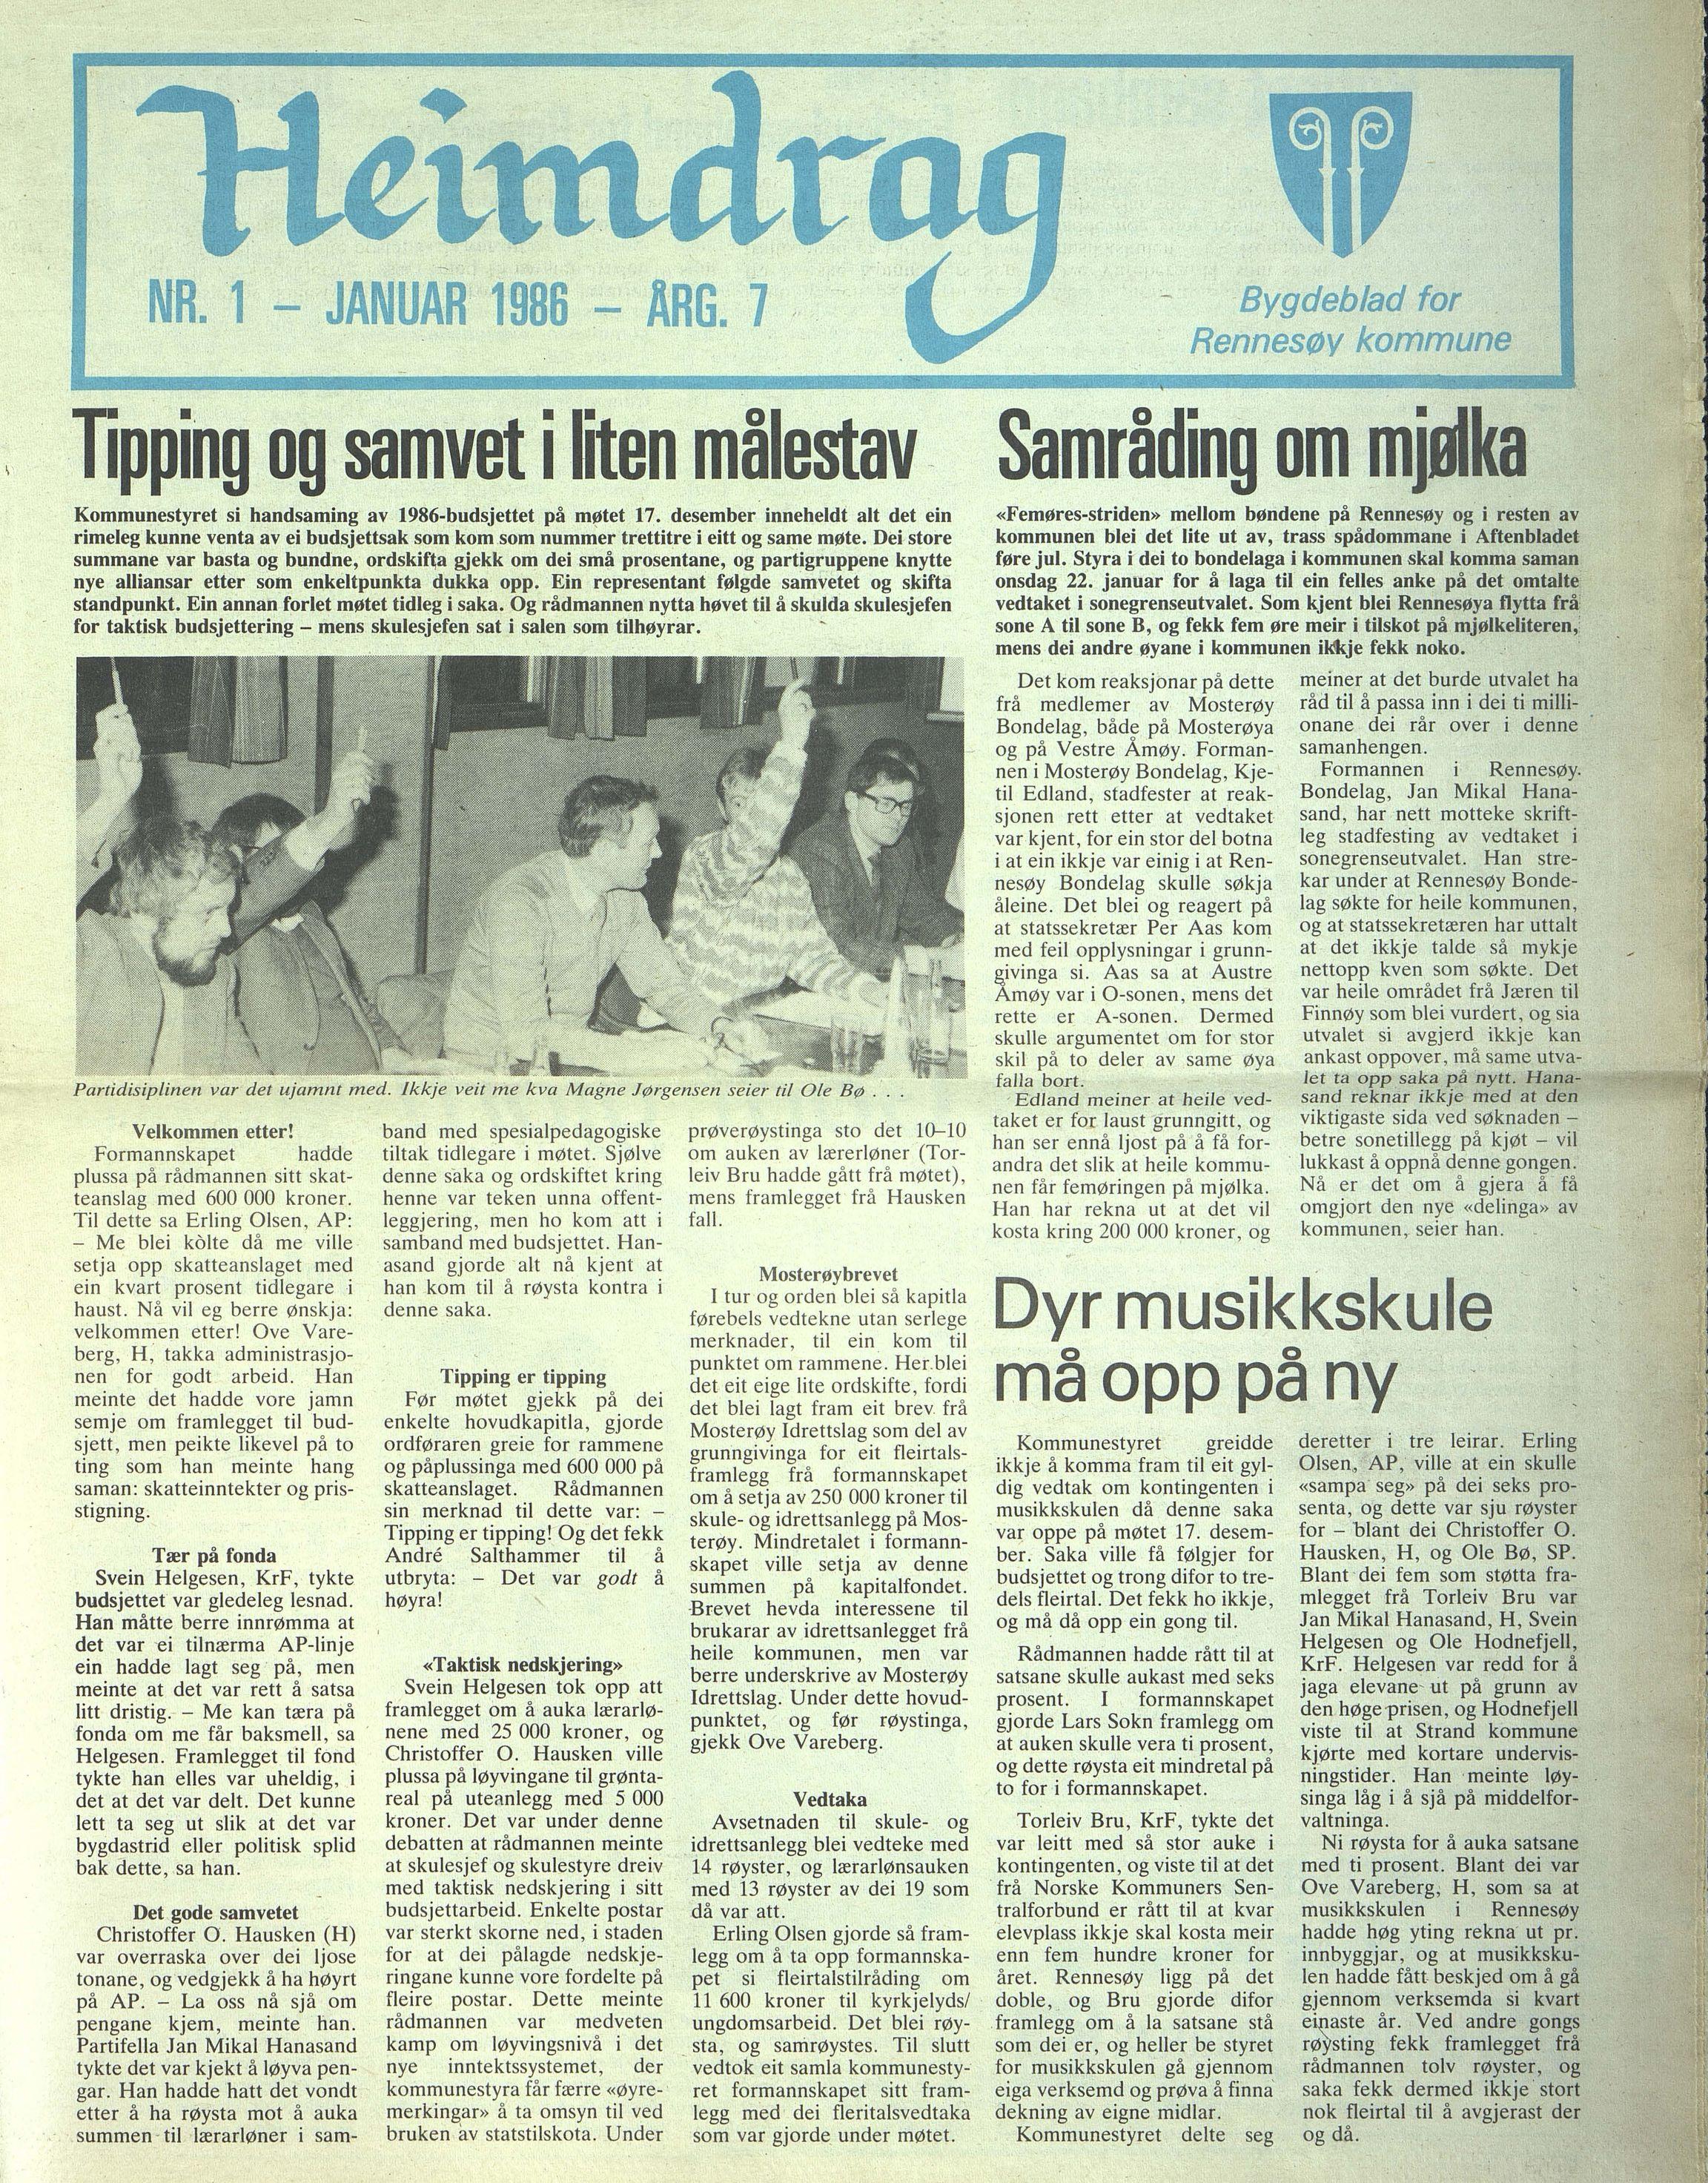 BYST, Rennesøy kommune. Heimdrag, lokalavis, X/Xa/L0008: Heimdrag 1986, 1986